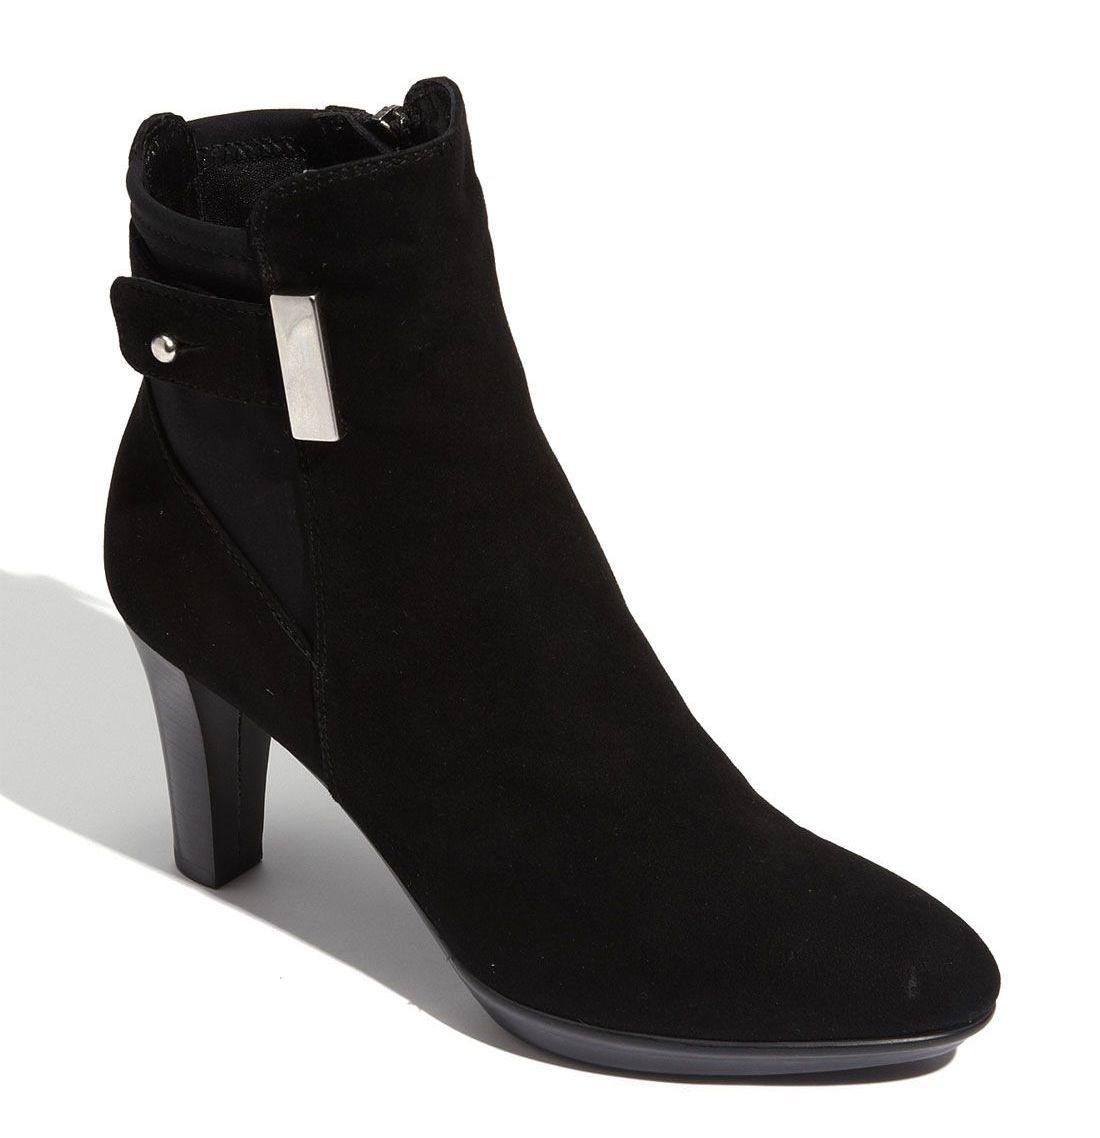 Aquatalia 'Ruby dry' boot